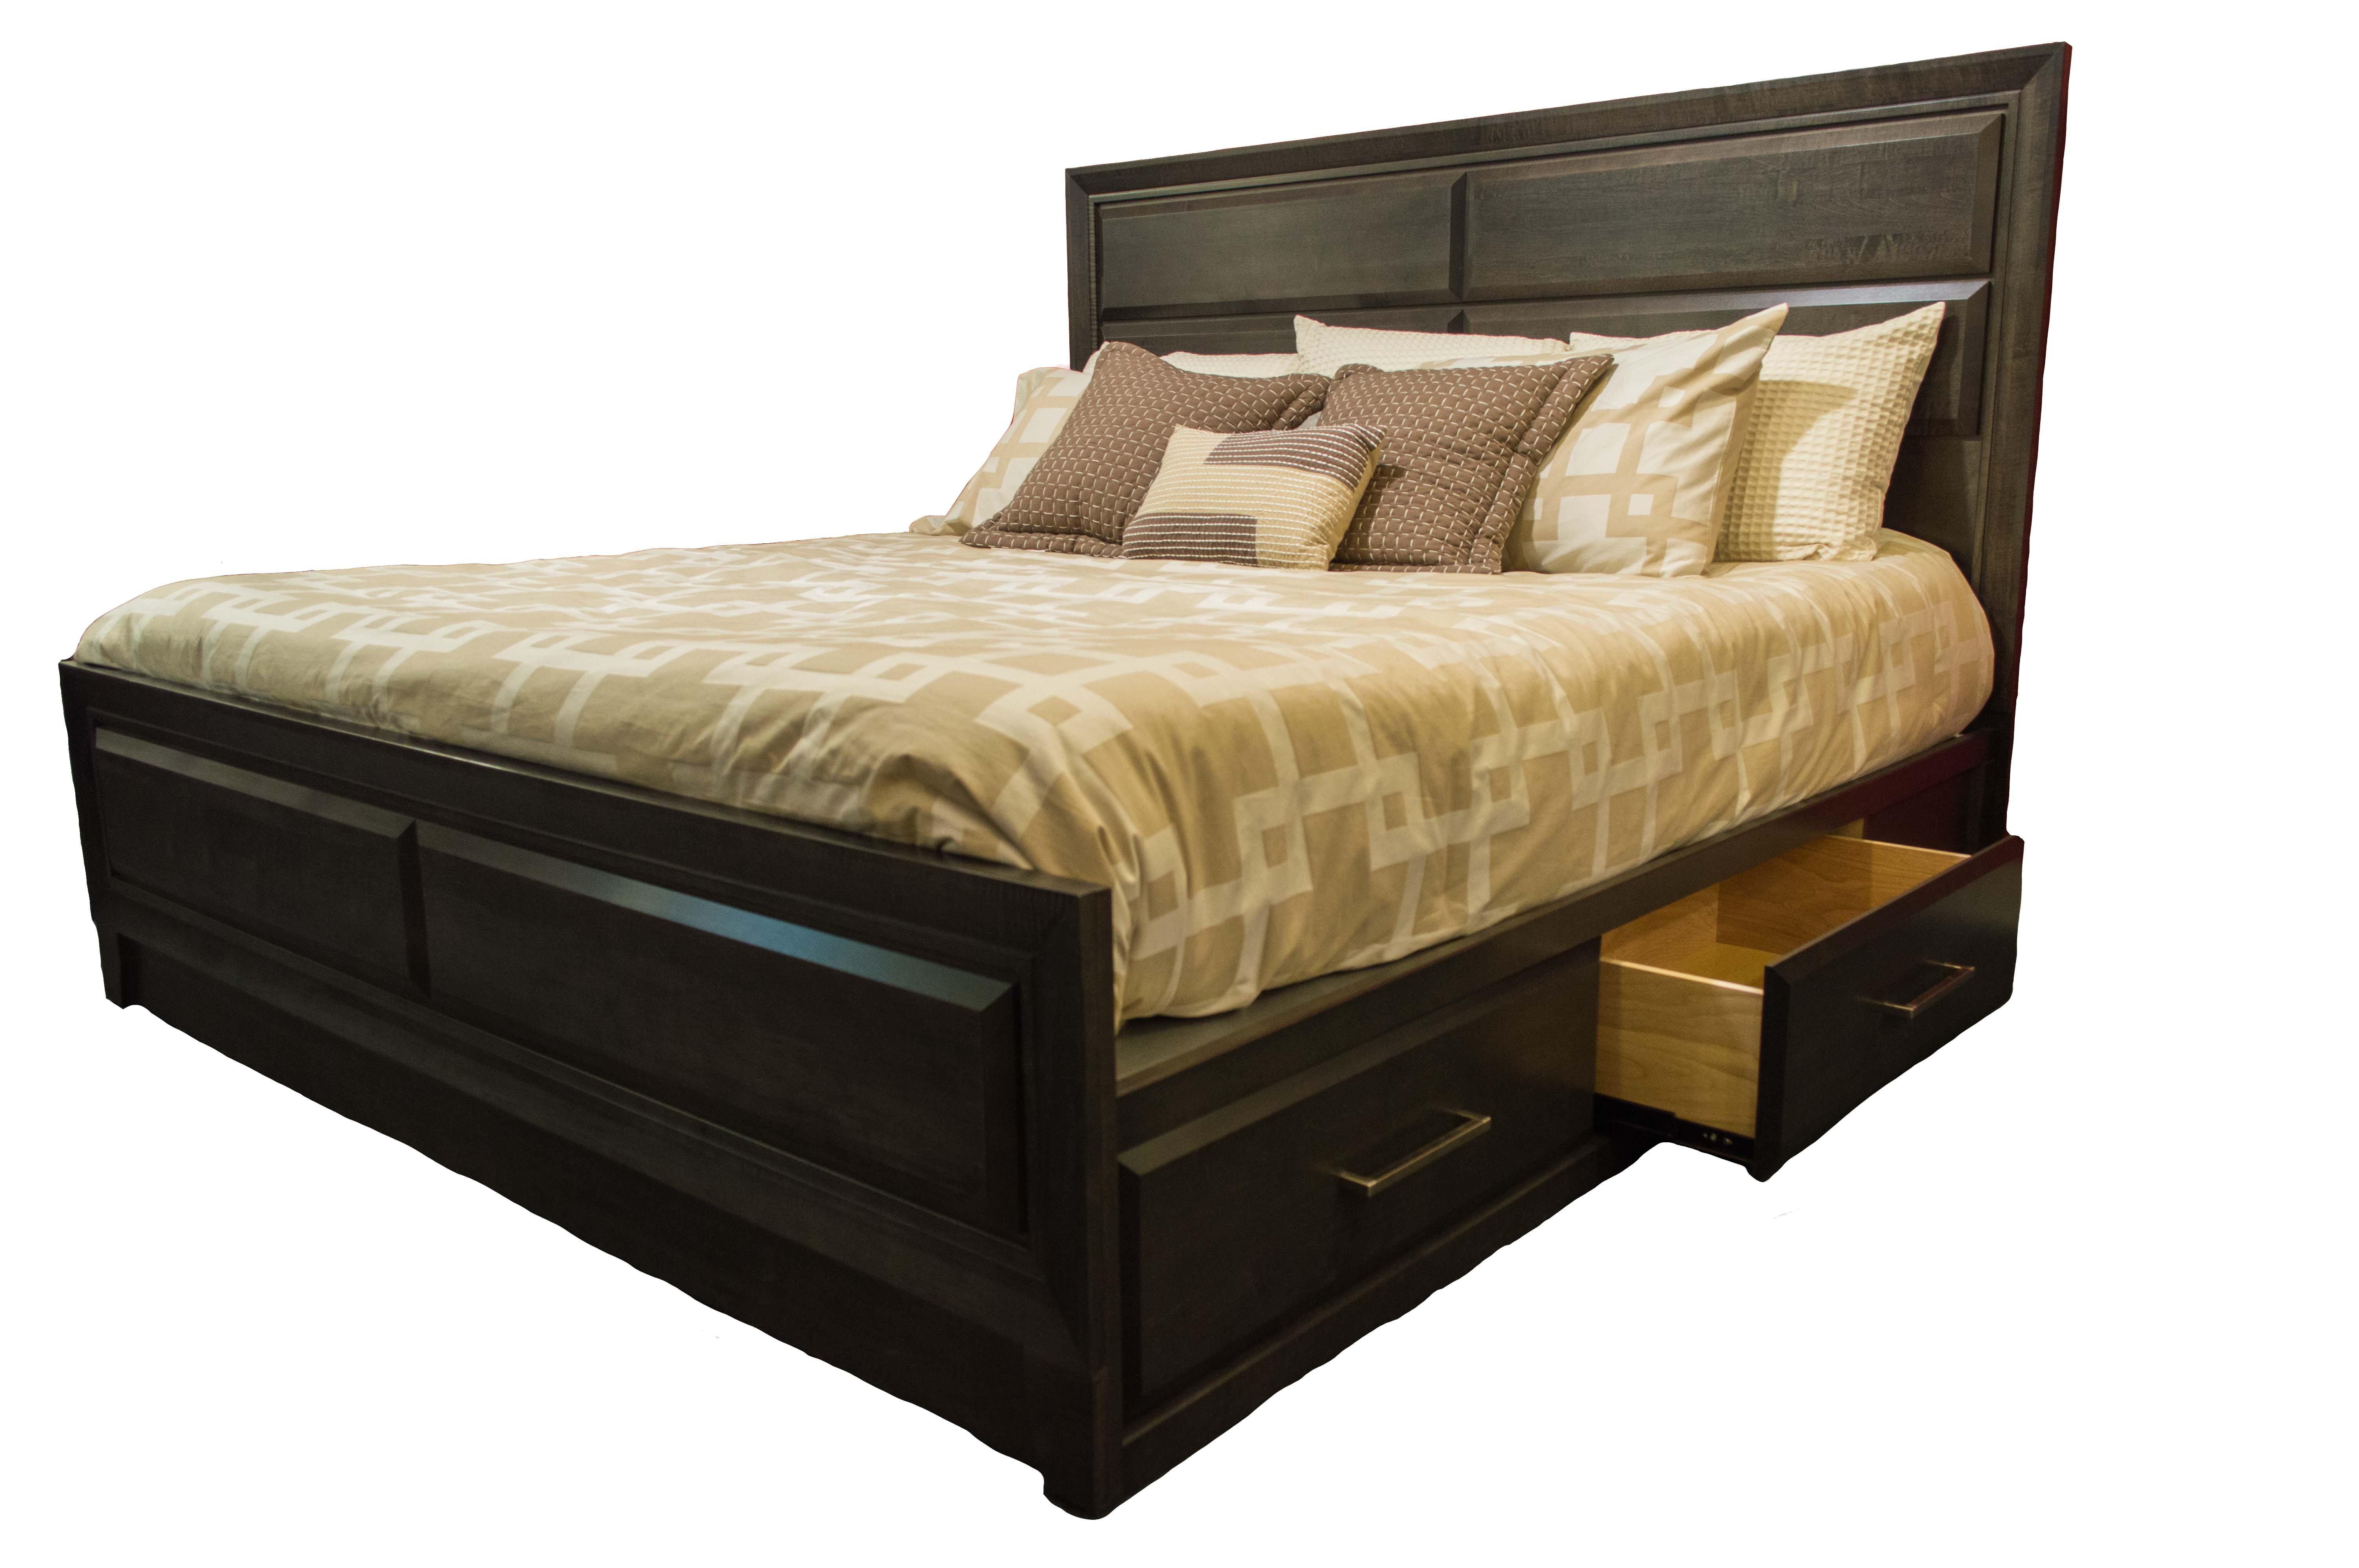 672 King Storage Bed